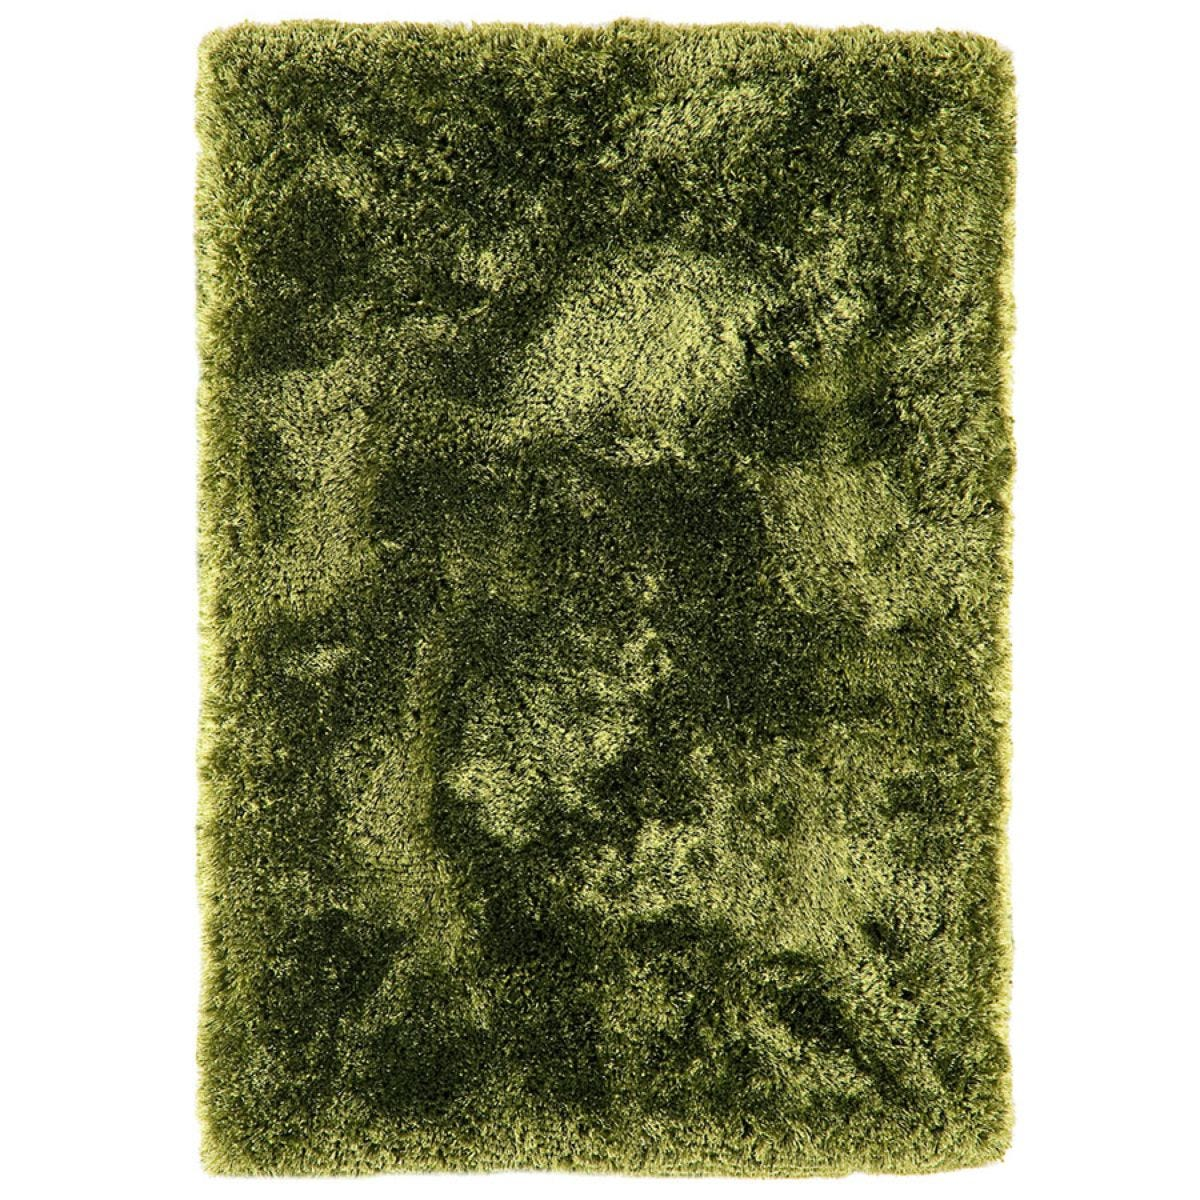 Asiatic Plush Shaggy Rug, 70 x 140cm - Green